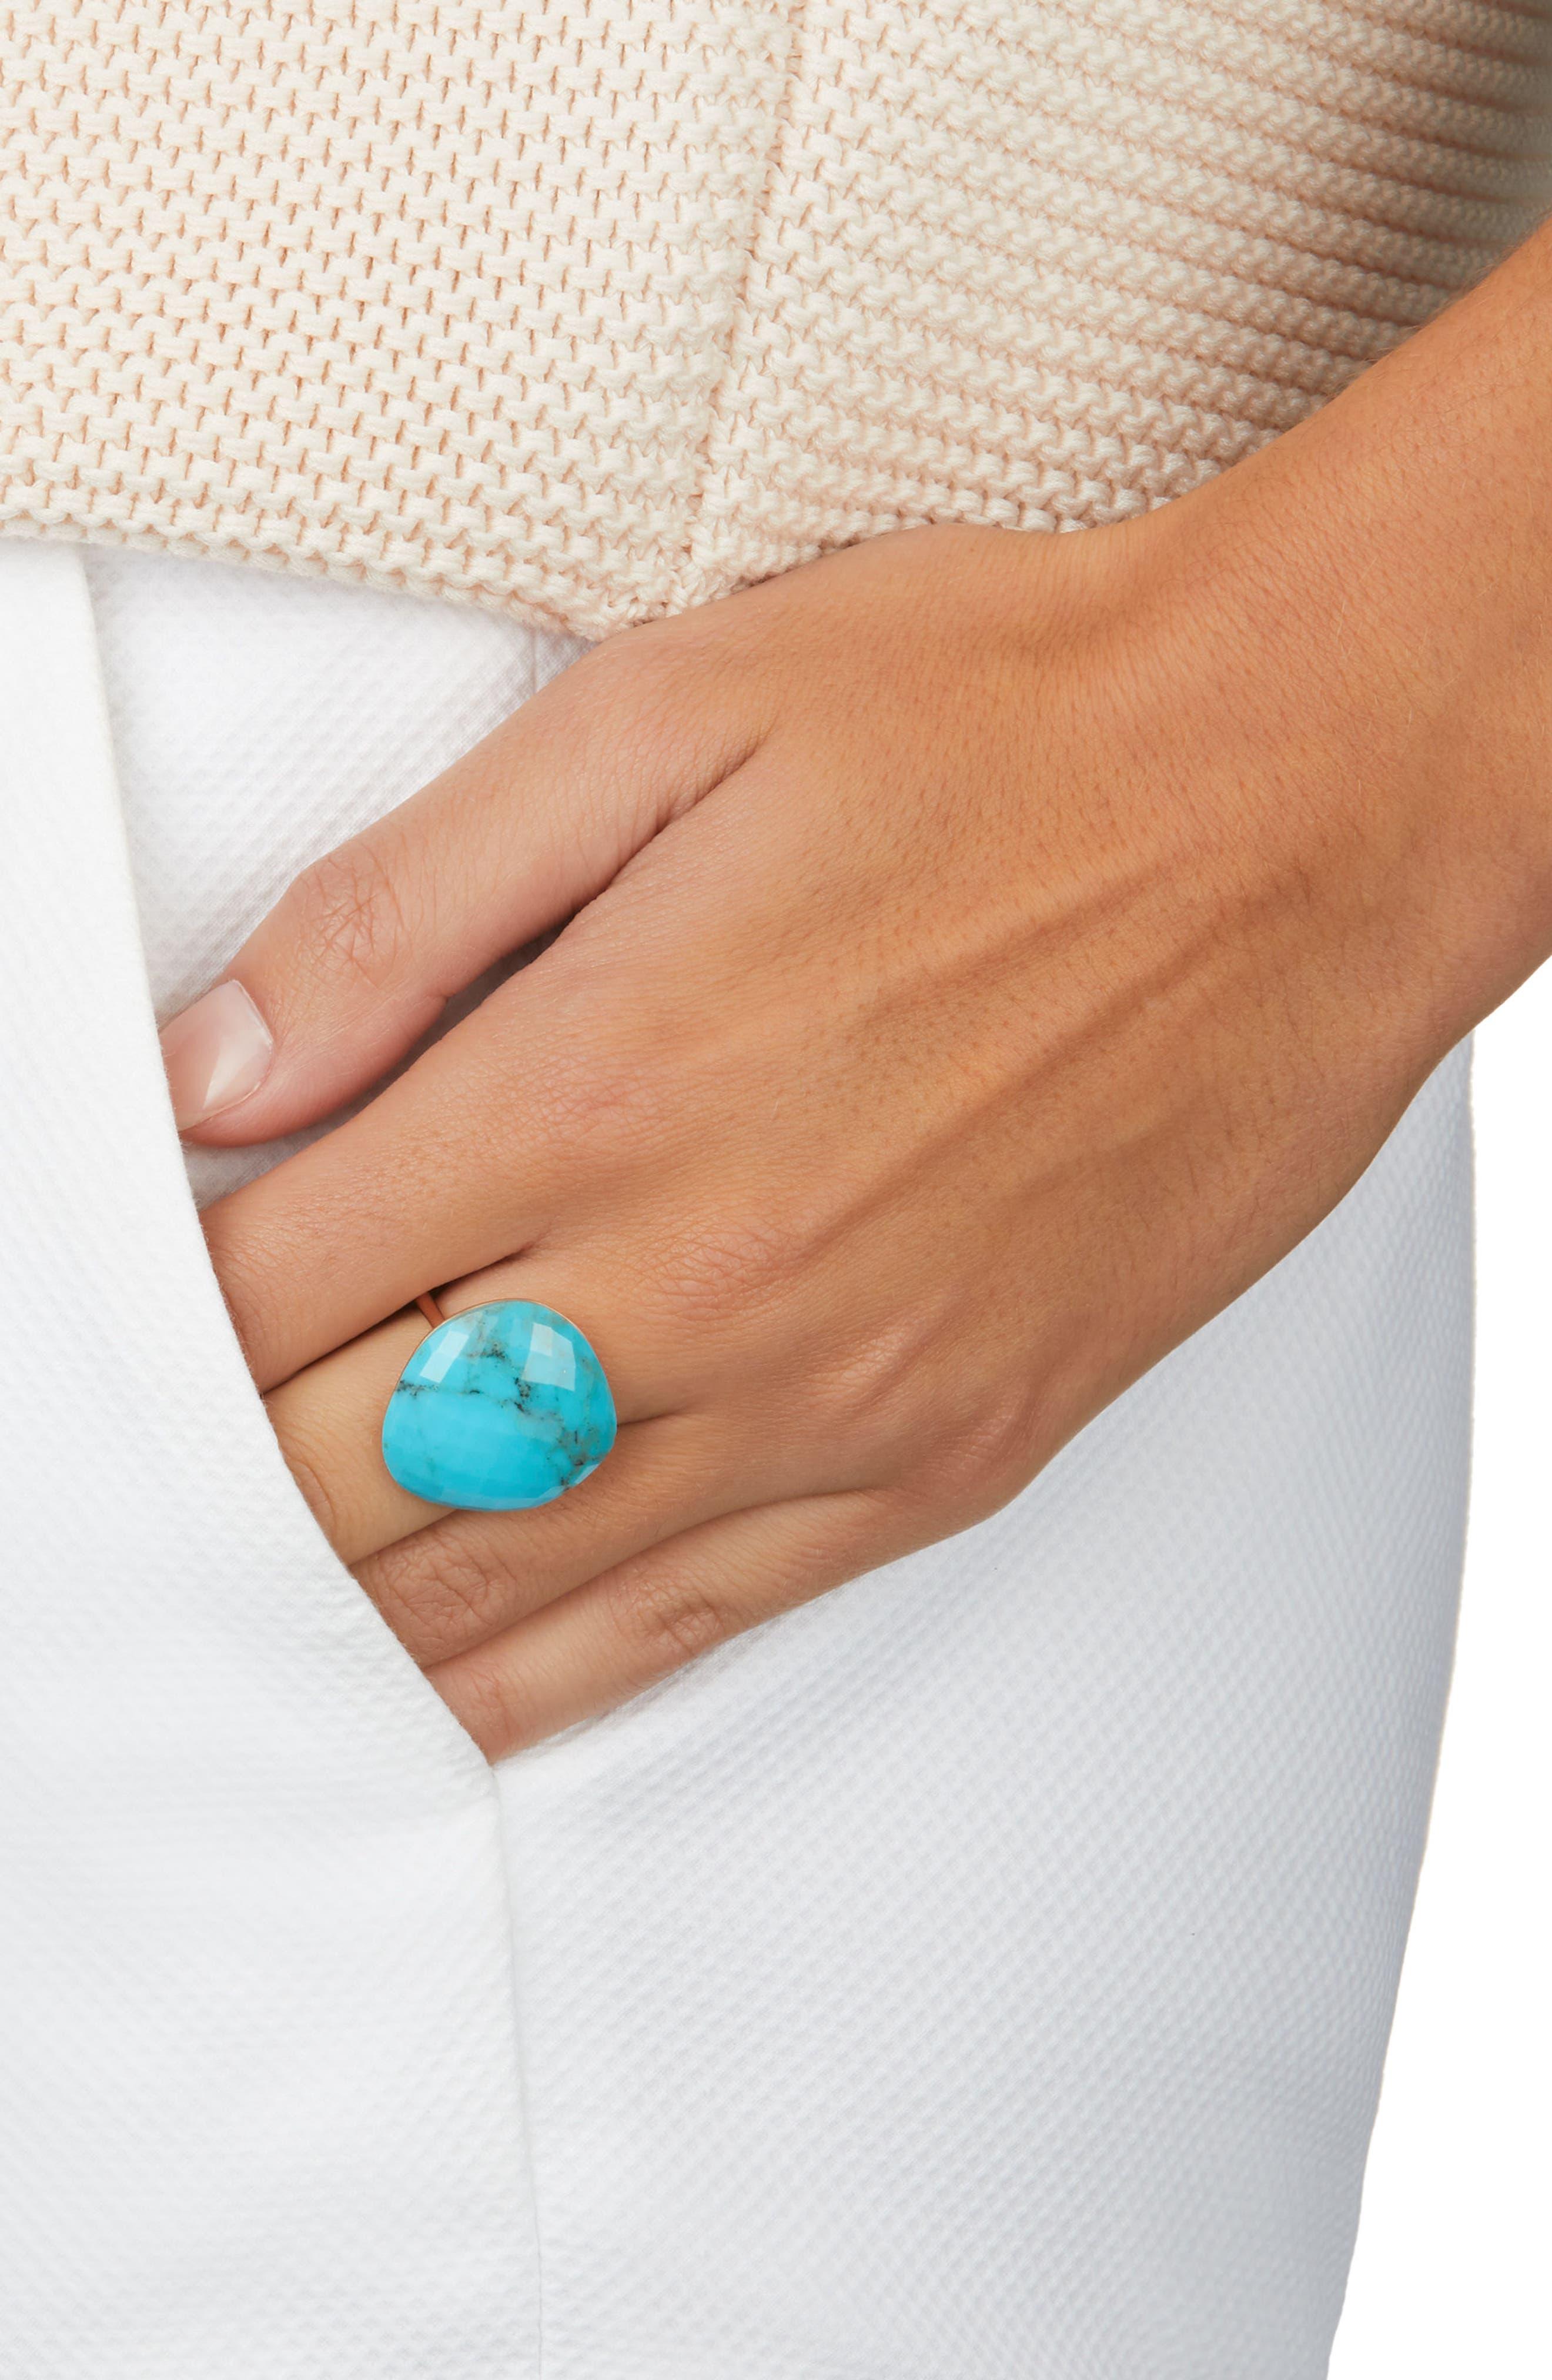 Nura Large Pebble Ring,                             Alternate thumbnail 2, color,                             TURQUOISE